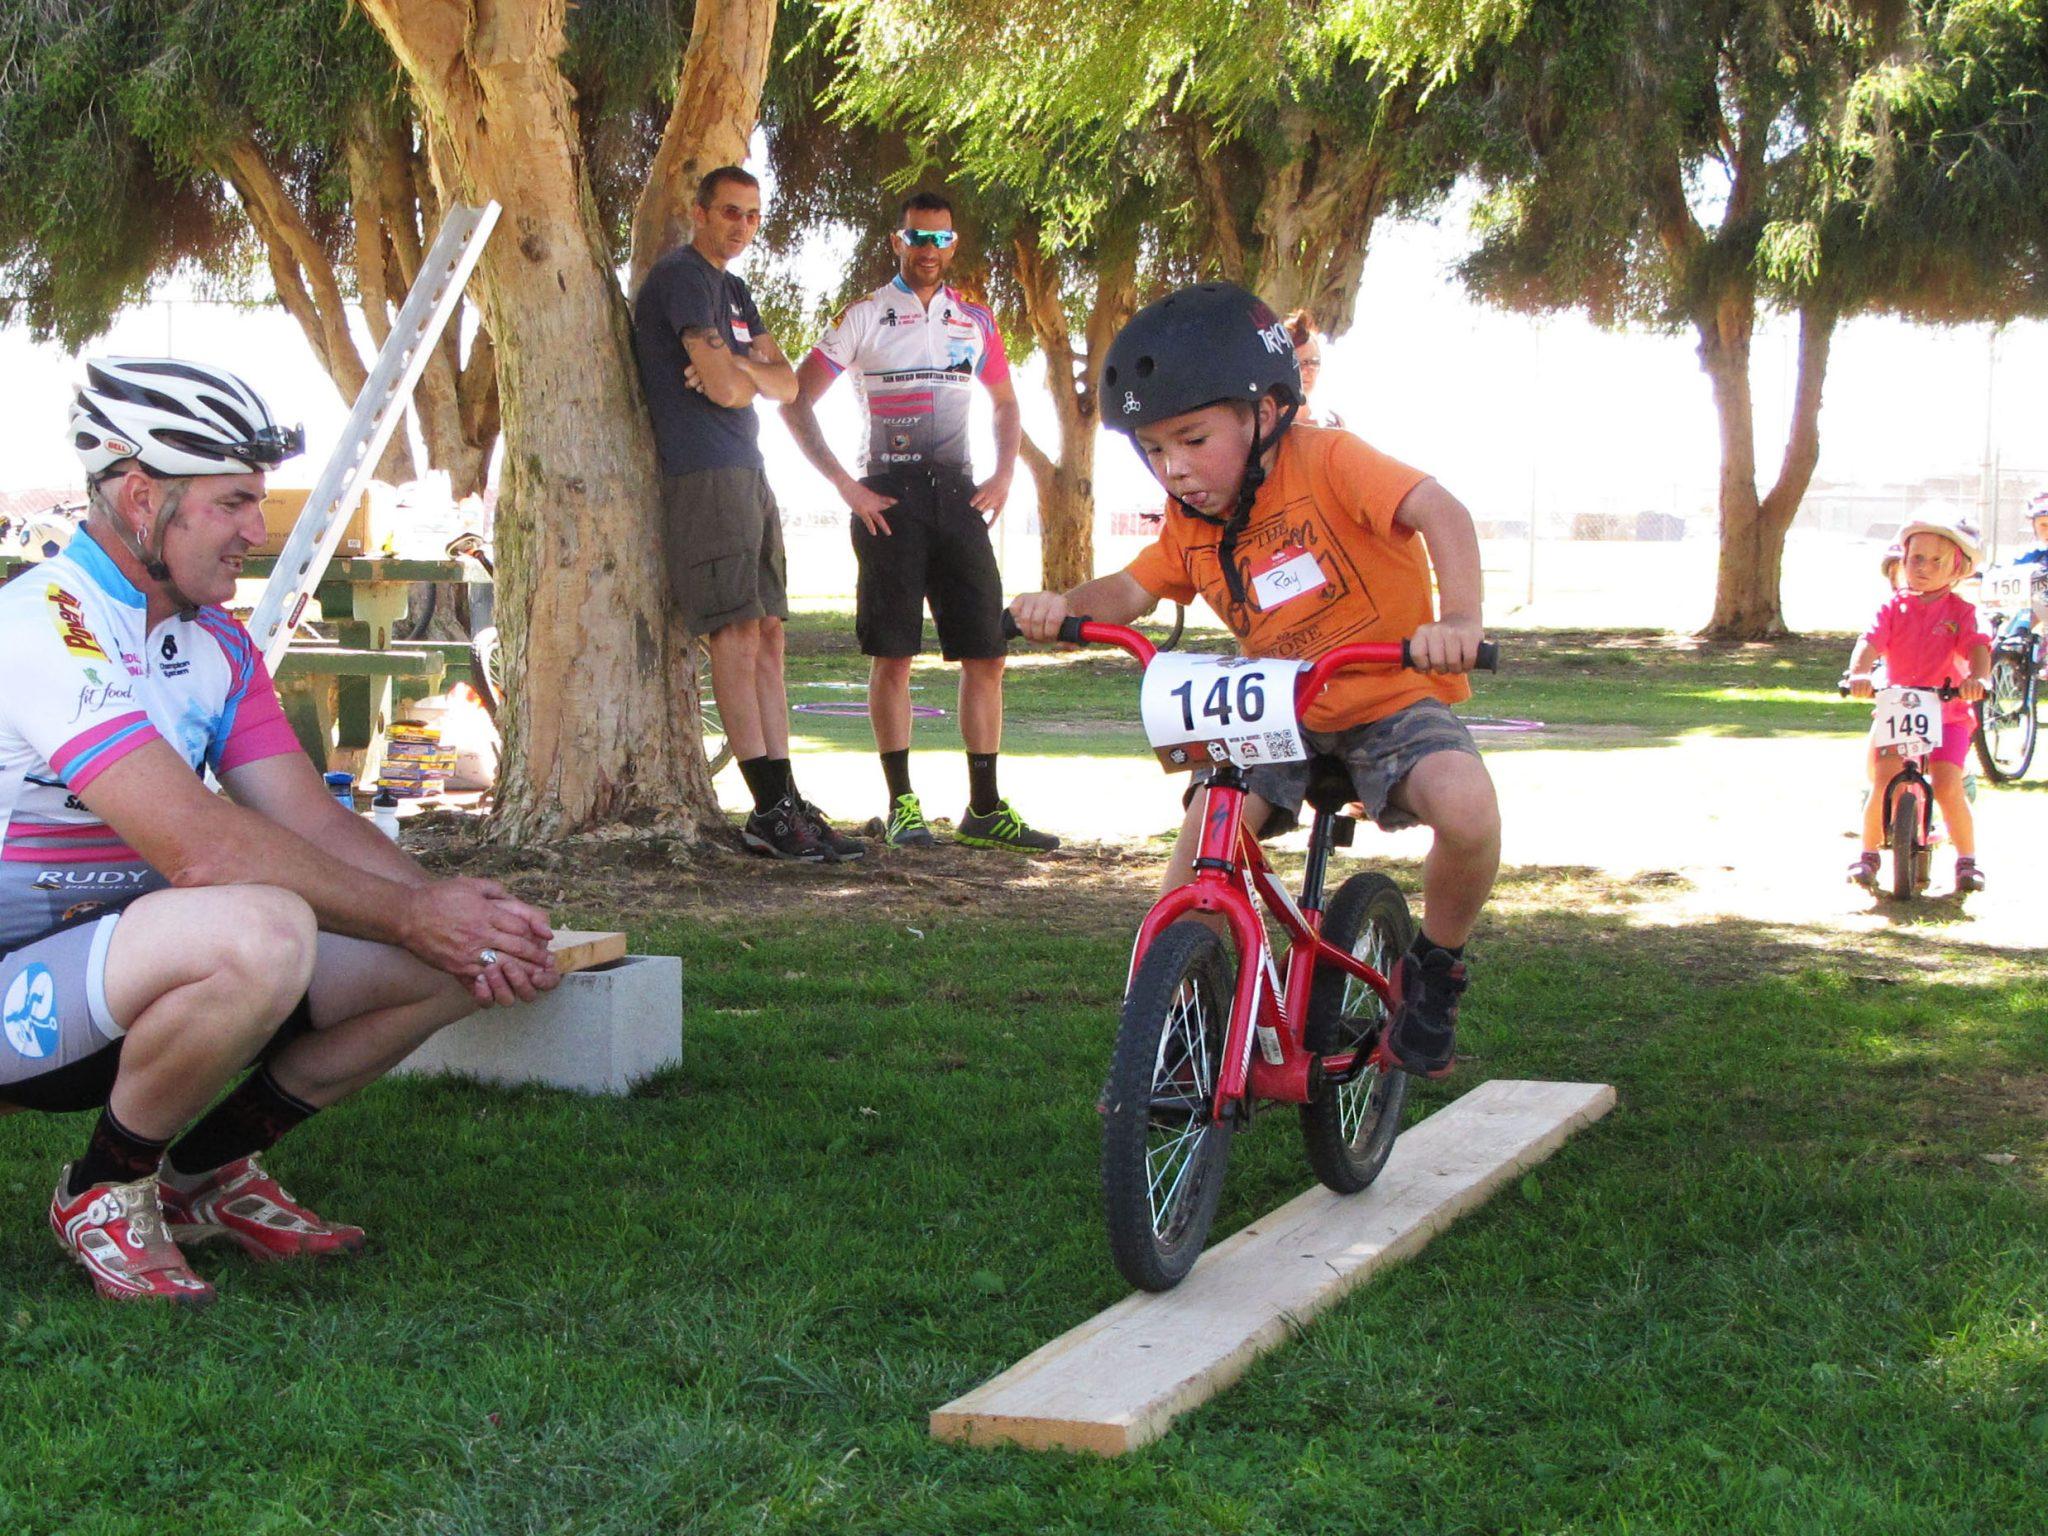 IMBA's Take a Kid Mountain Biking Day